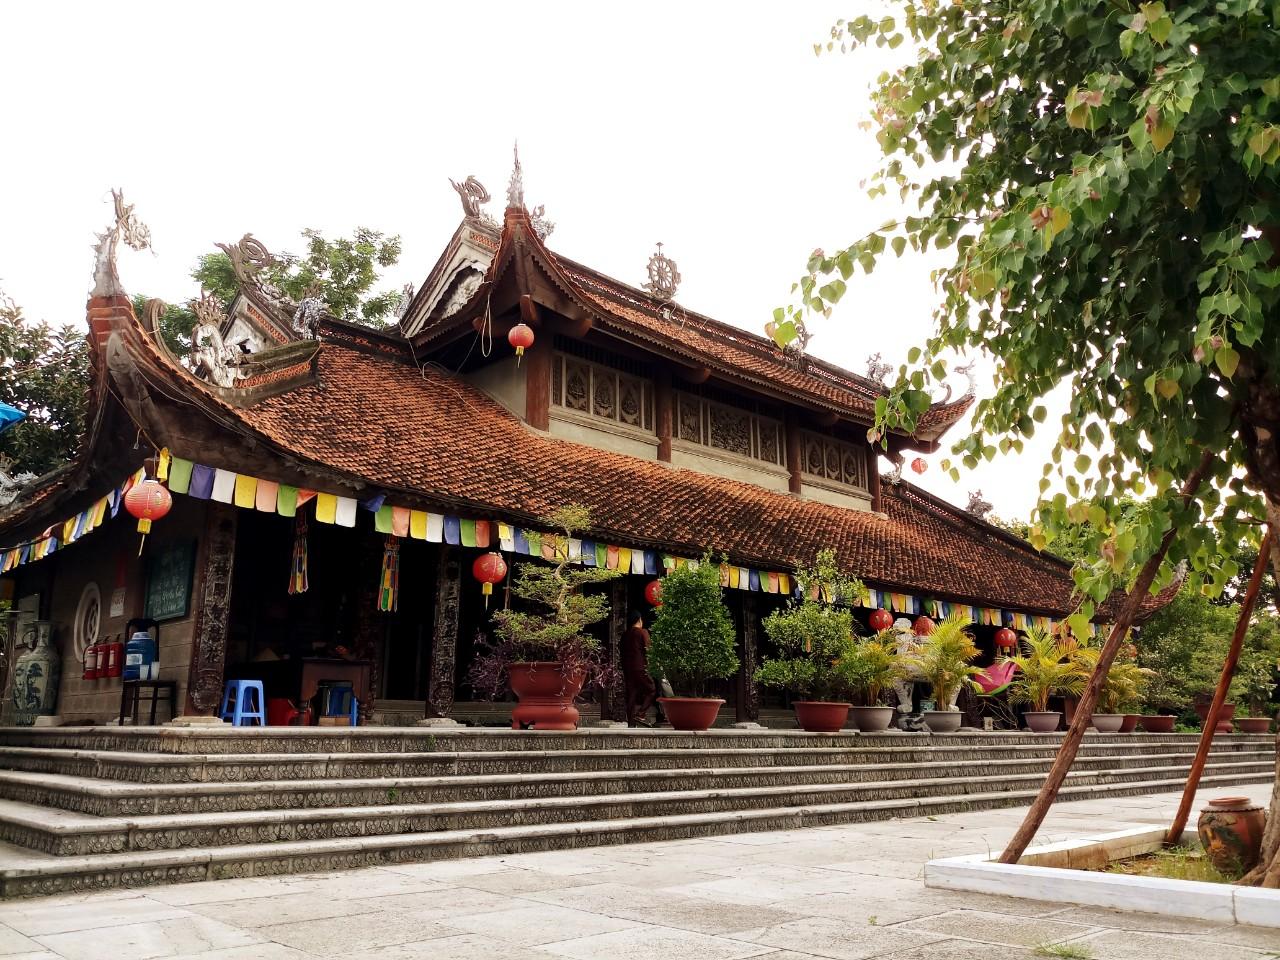 du lịch Phú Thọ 13